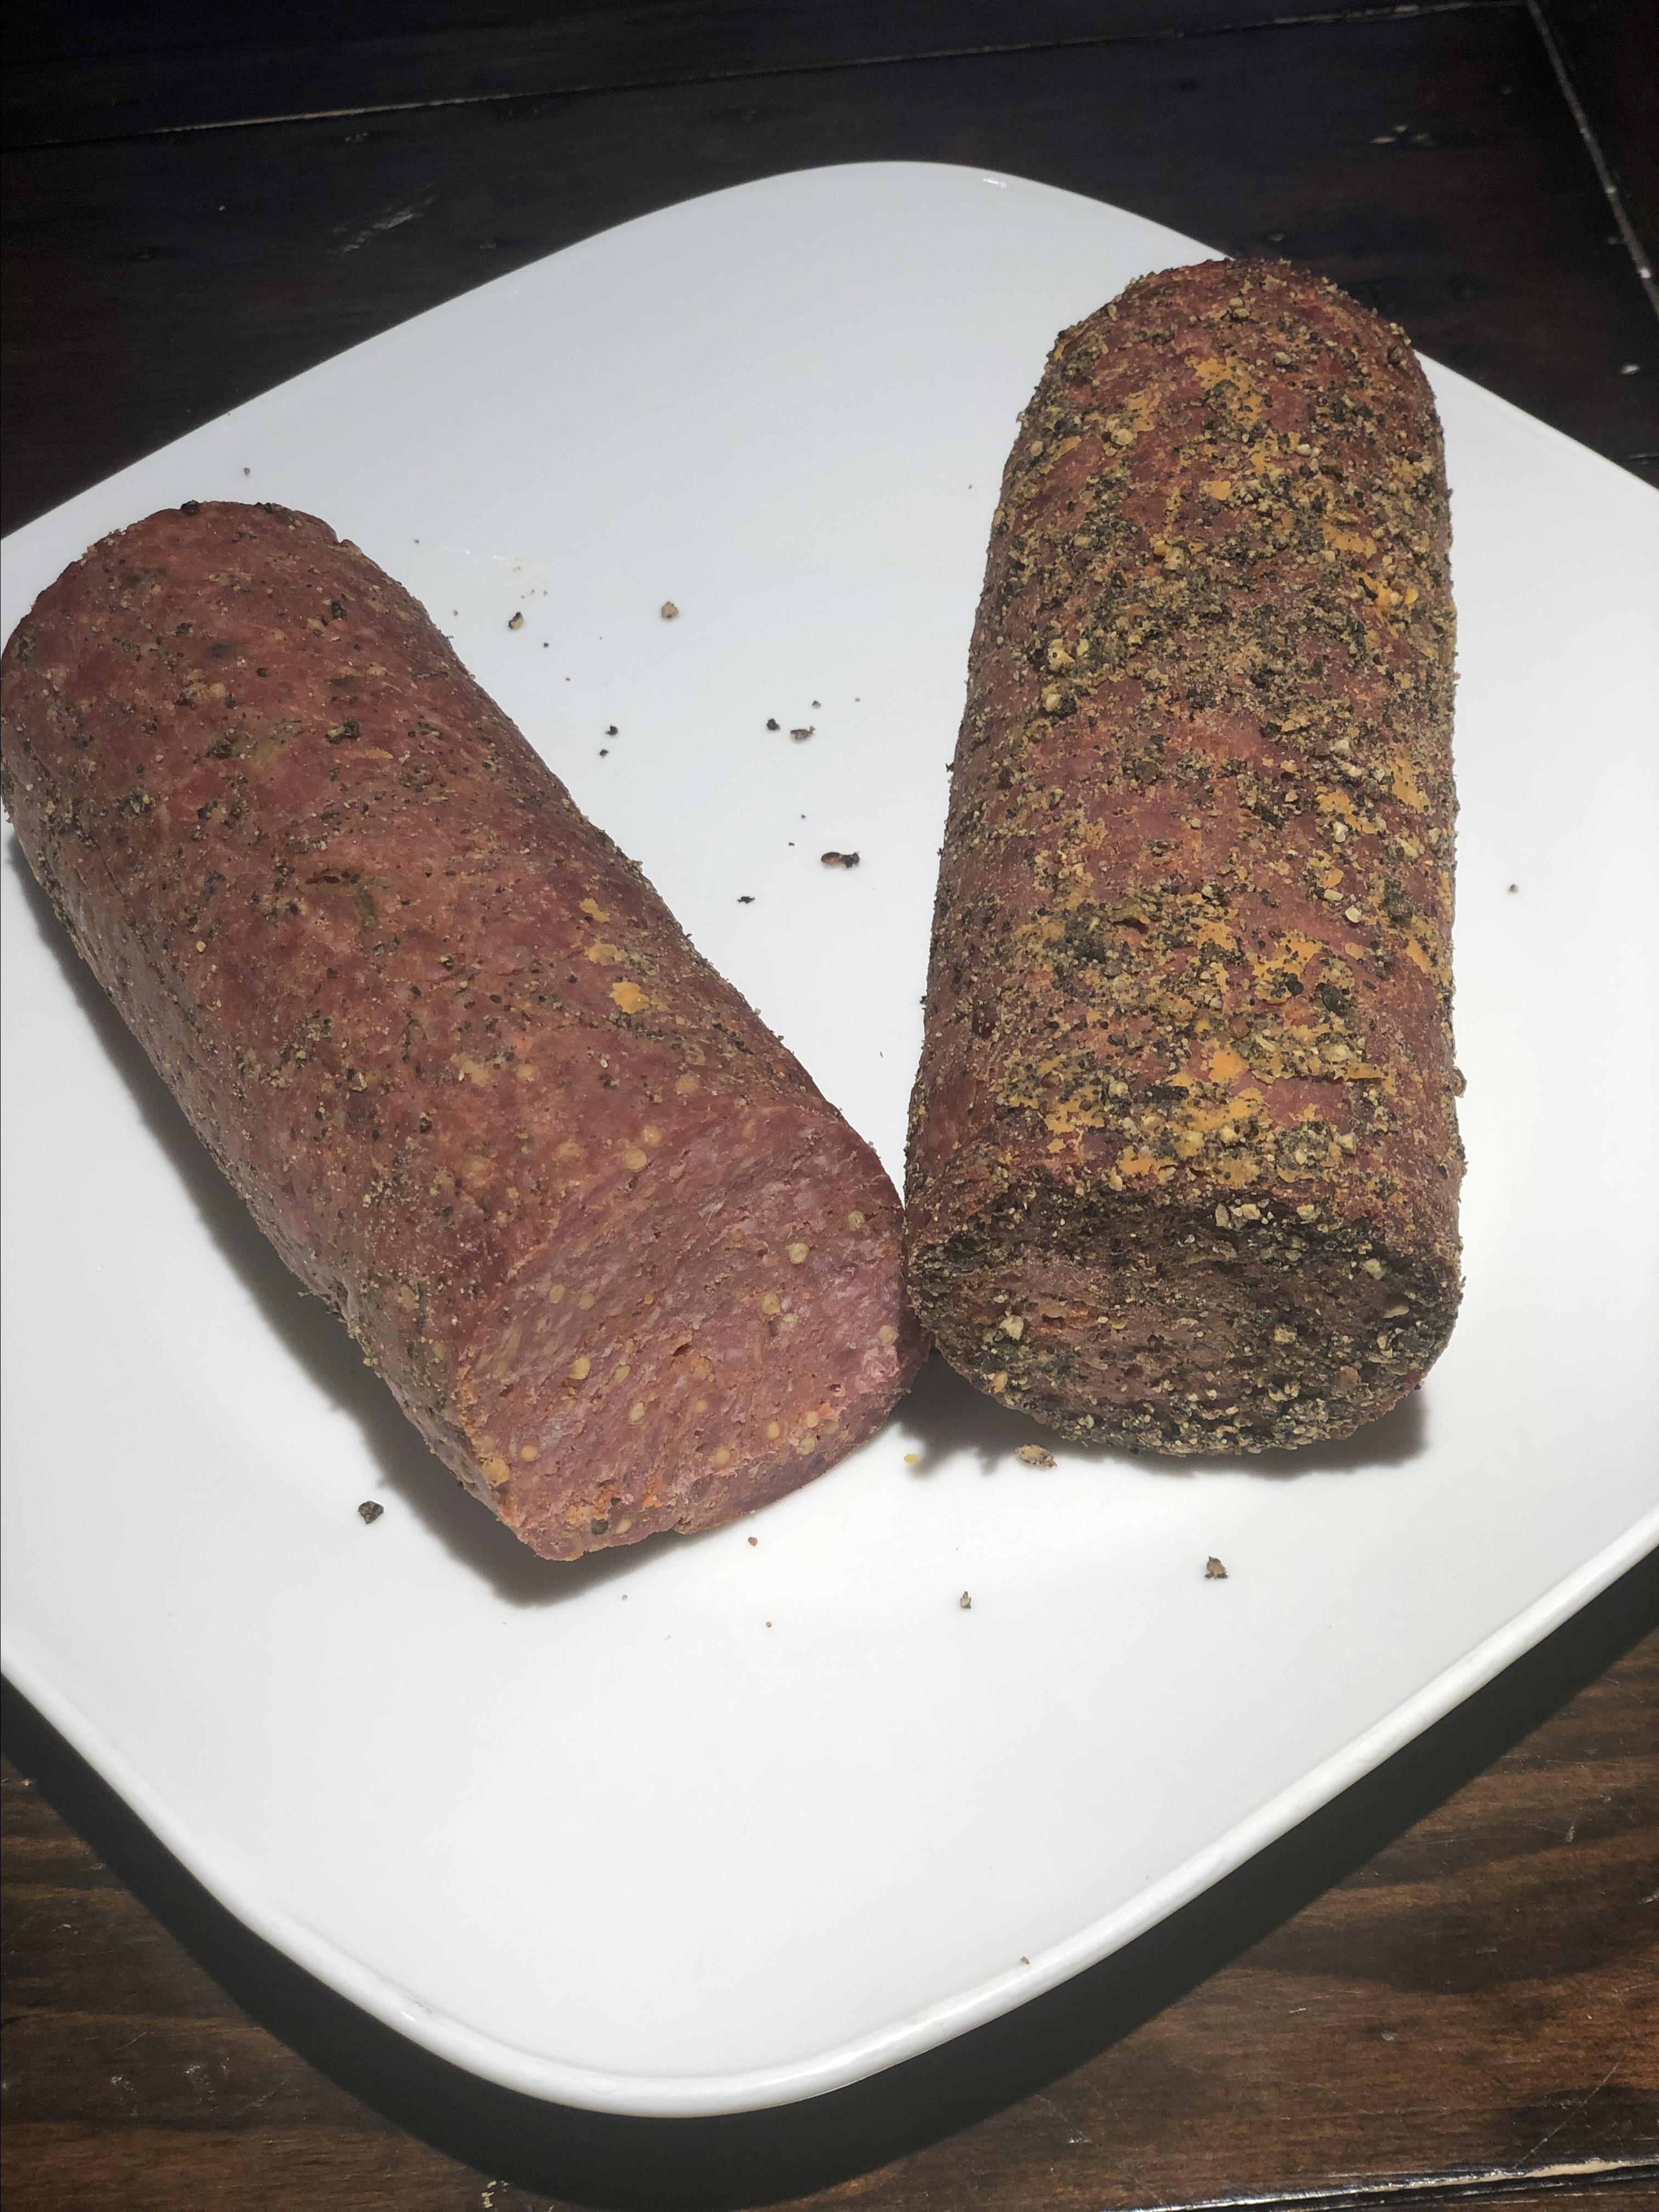 Sandy's Summer Sausage Catsanj